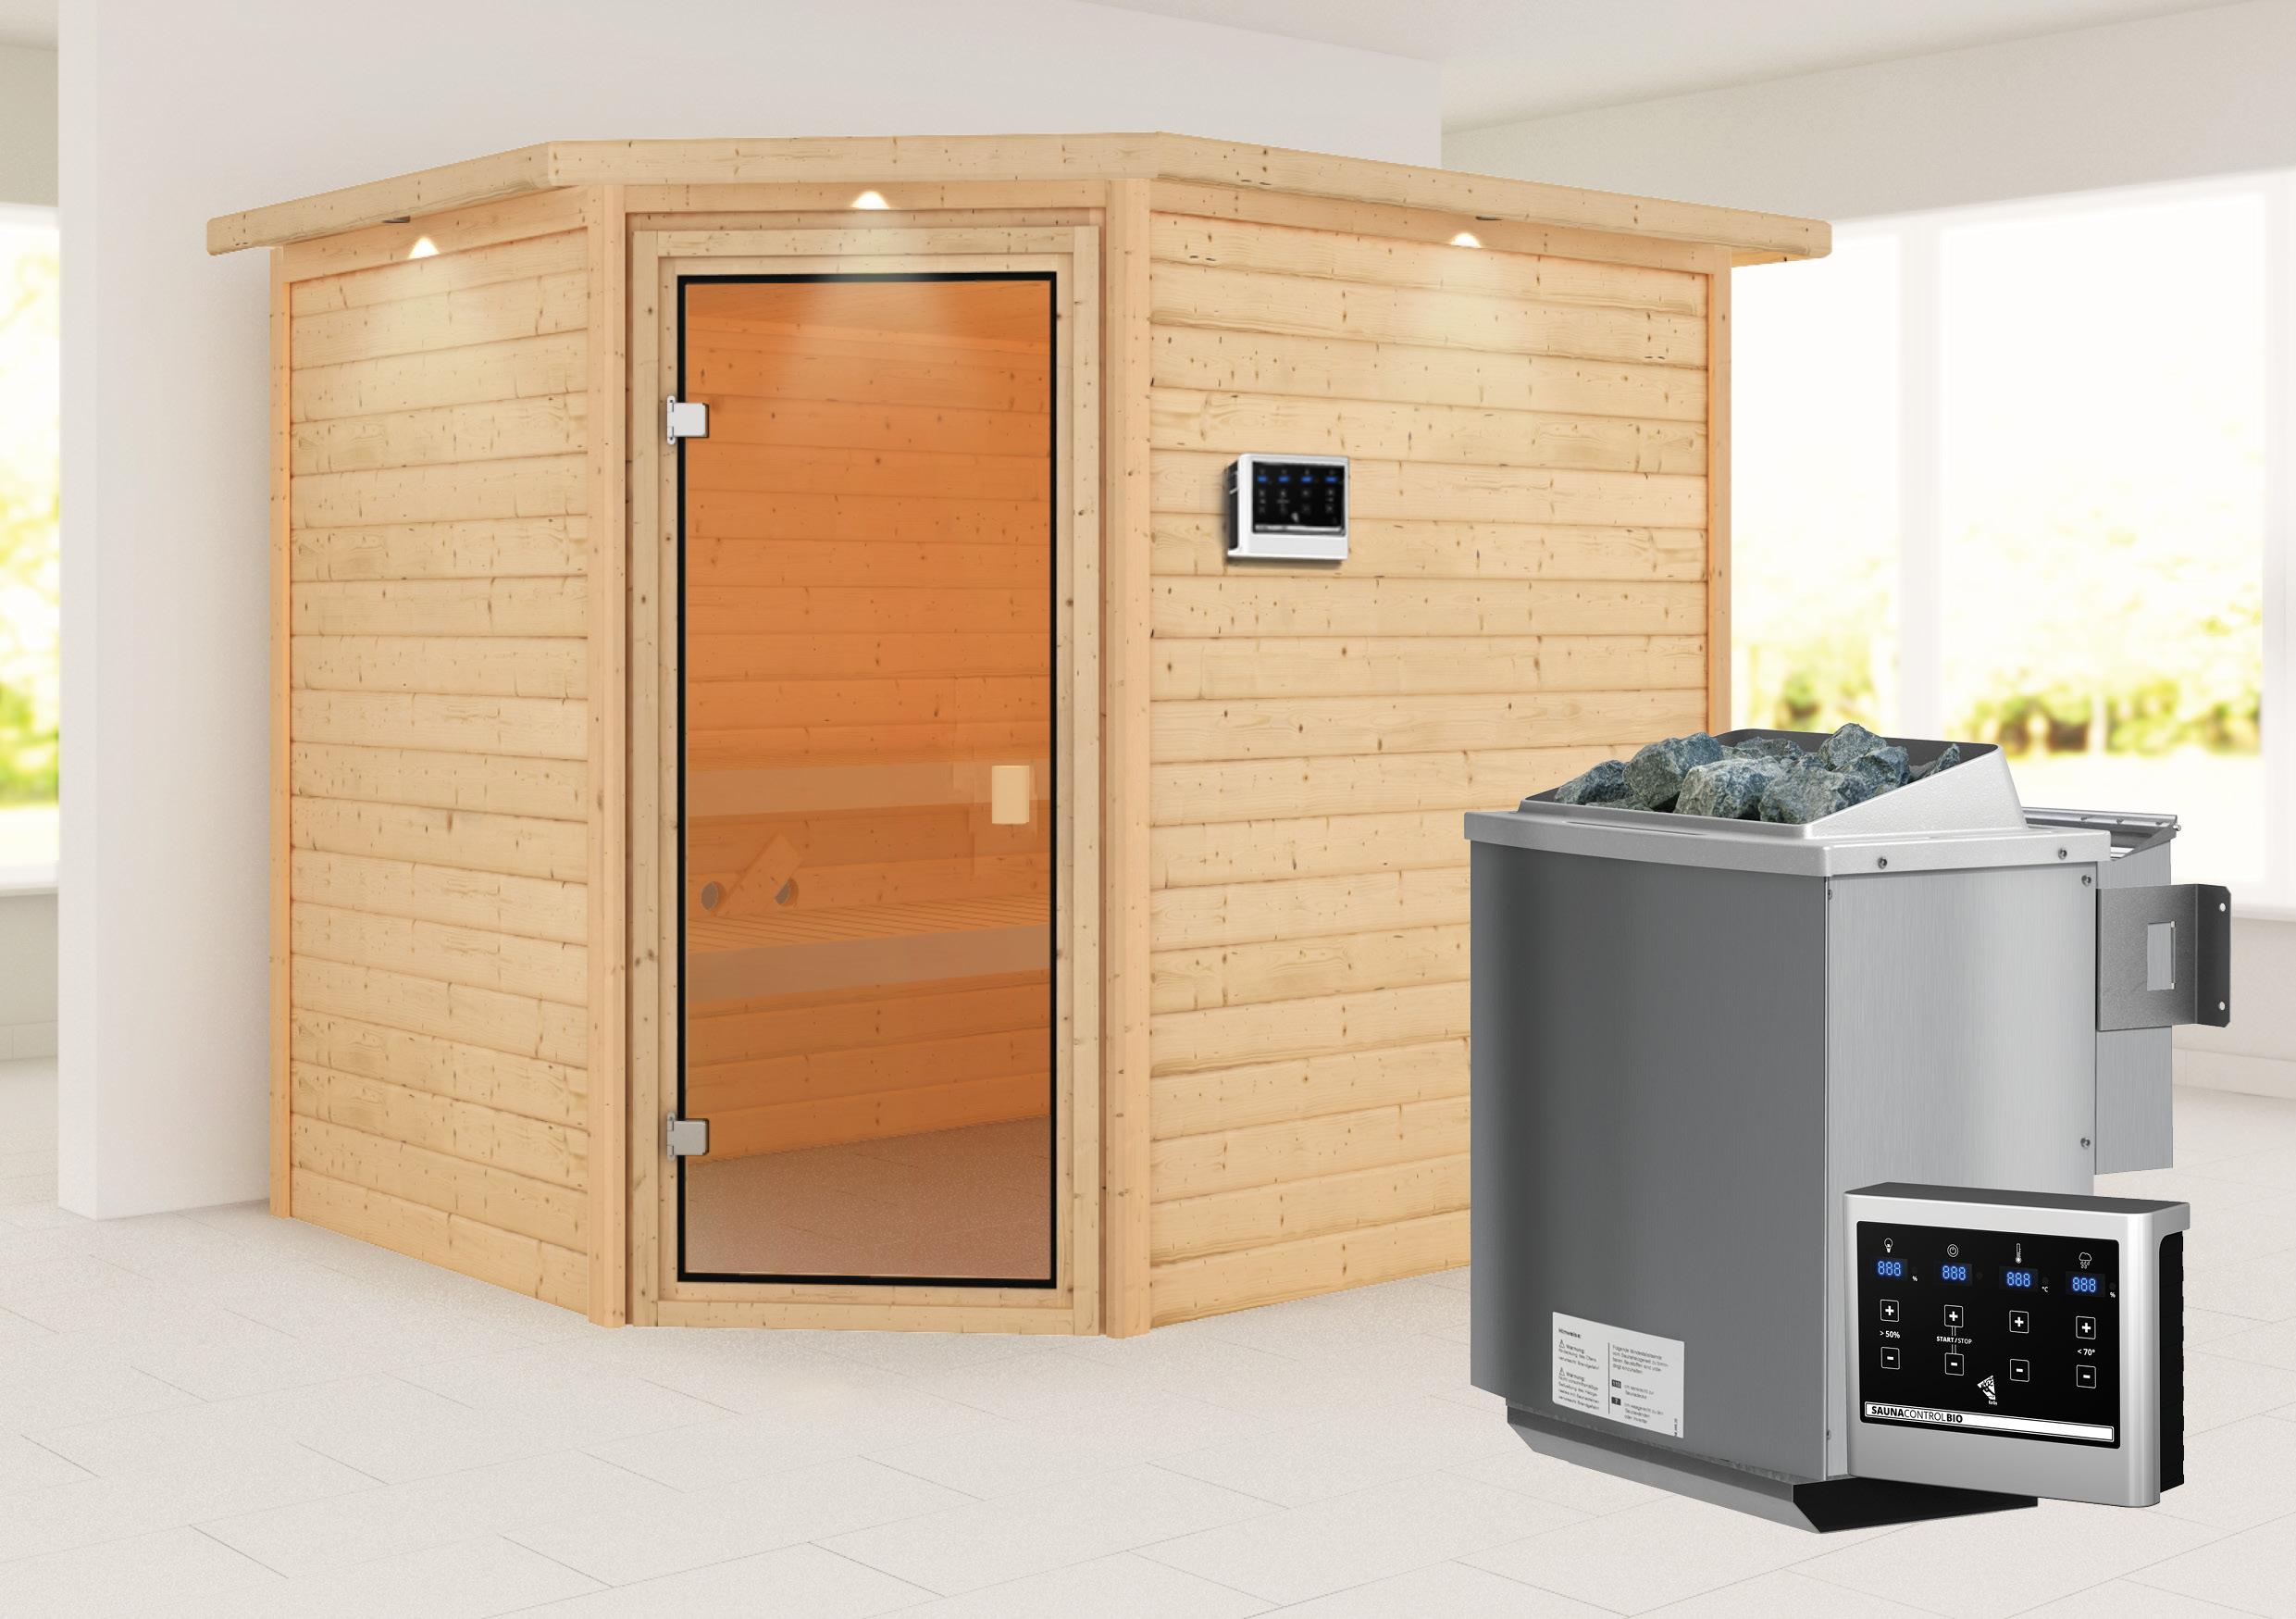 Woodfeeling Sauna Lisa 38mm Kranz Ofen Bio 9kW Tür Classic Bild 1